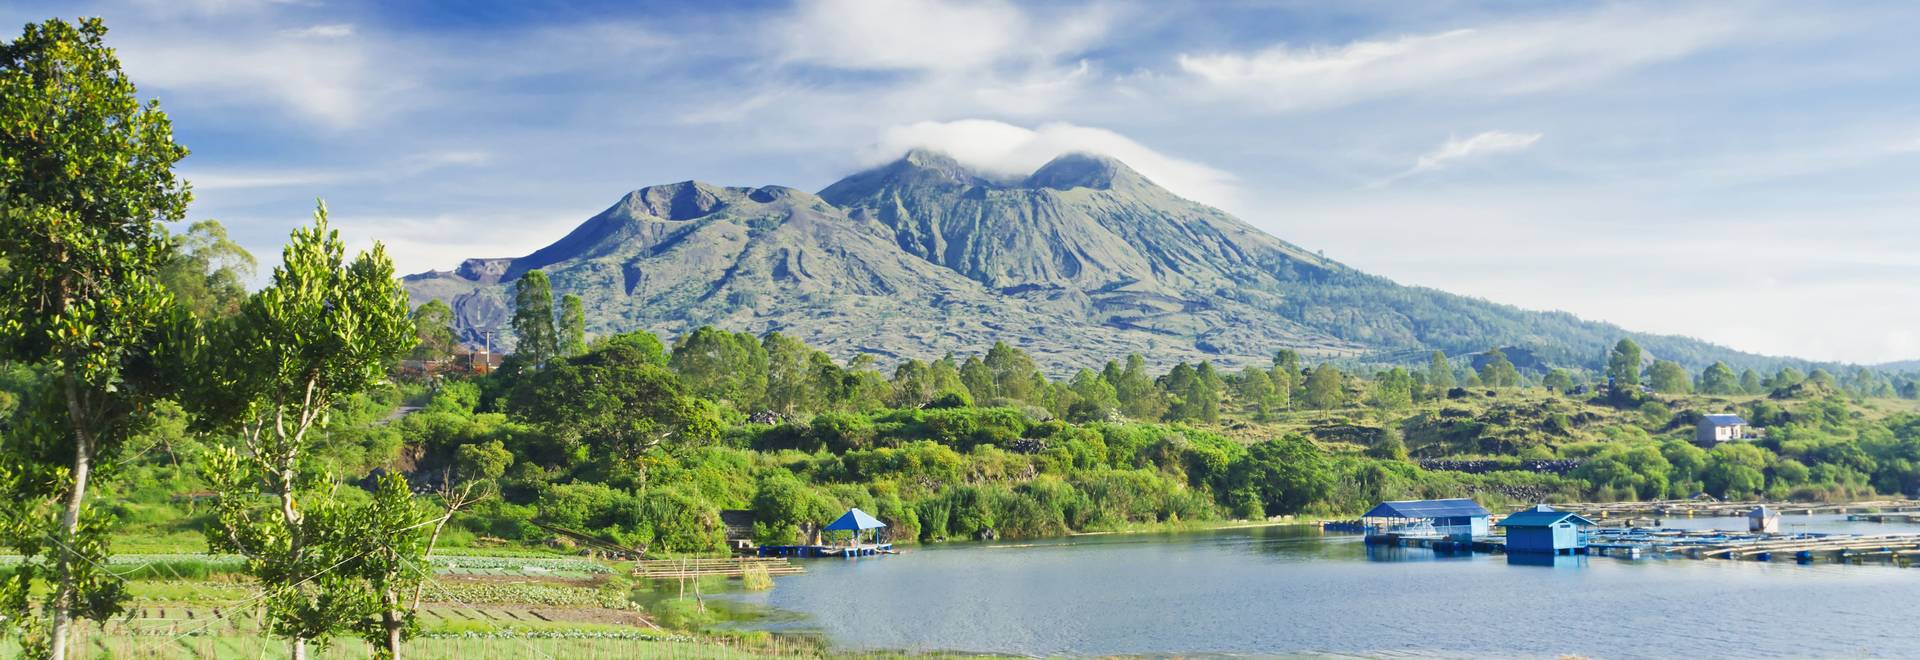 shutterstock_80183131 Landscape of Batur volcano.jpg